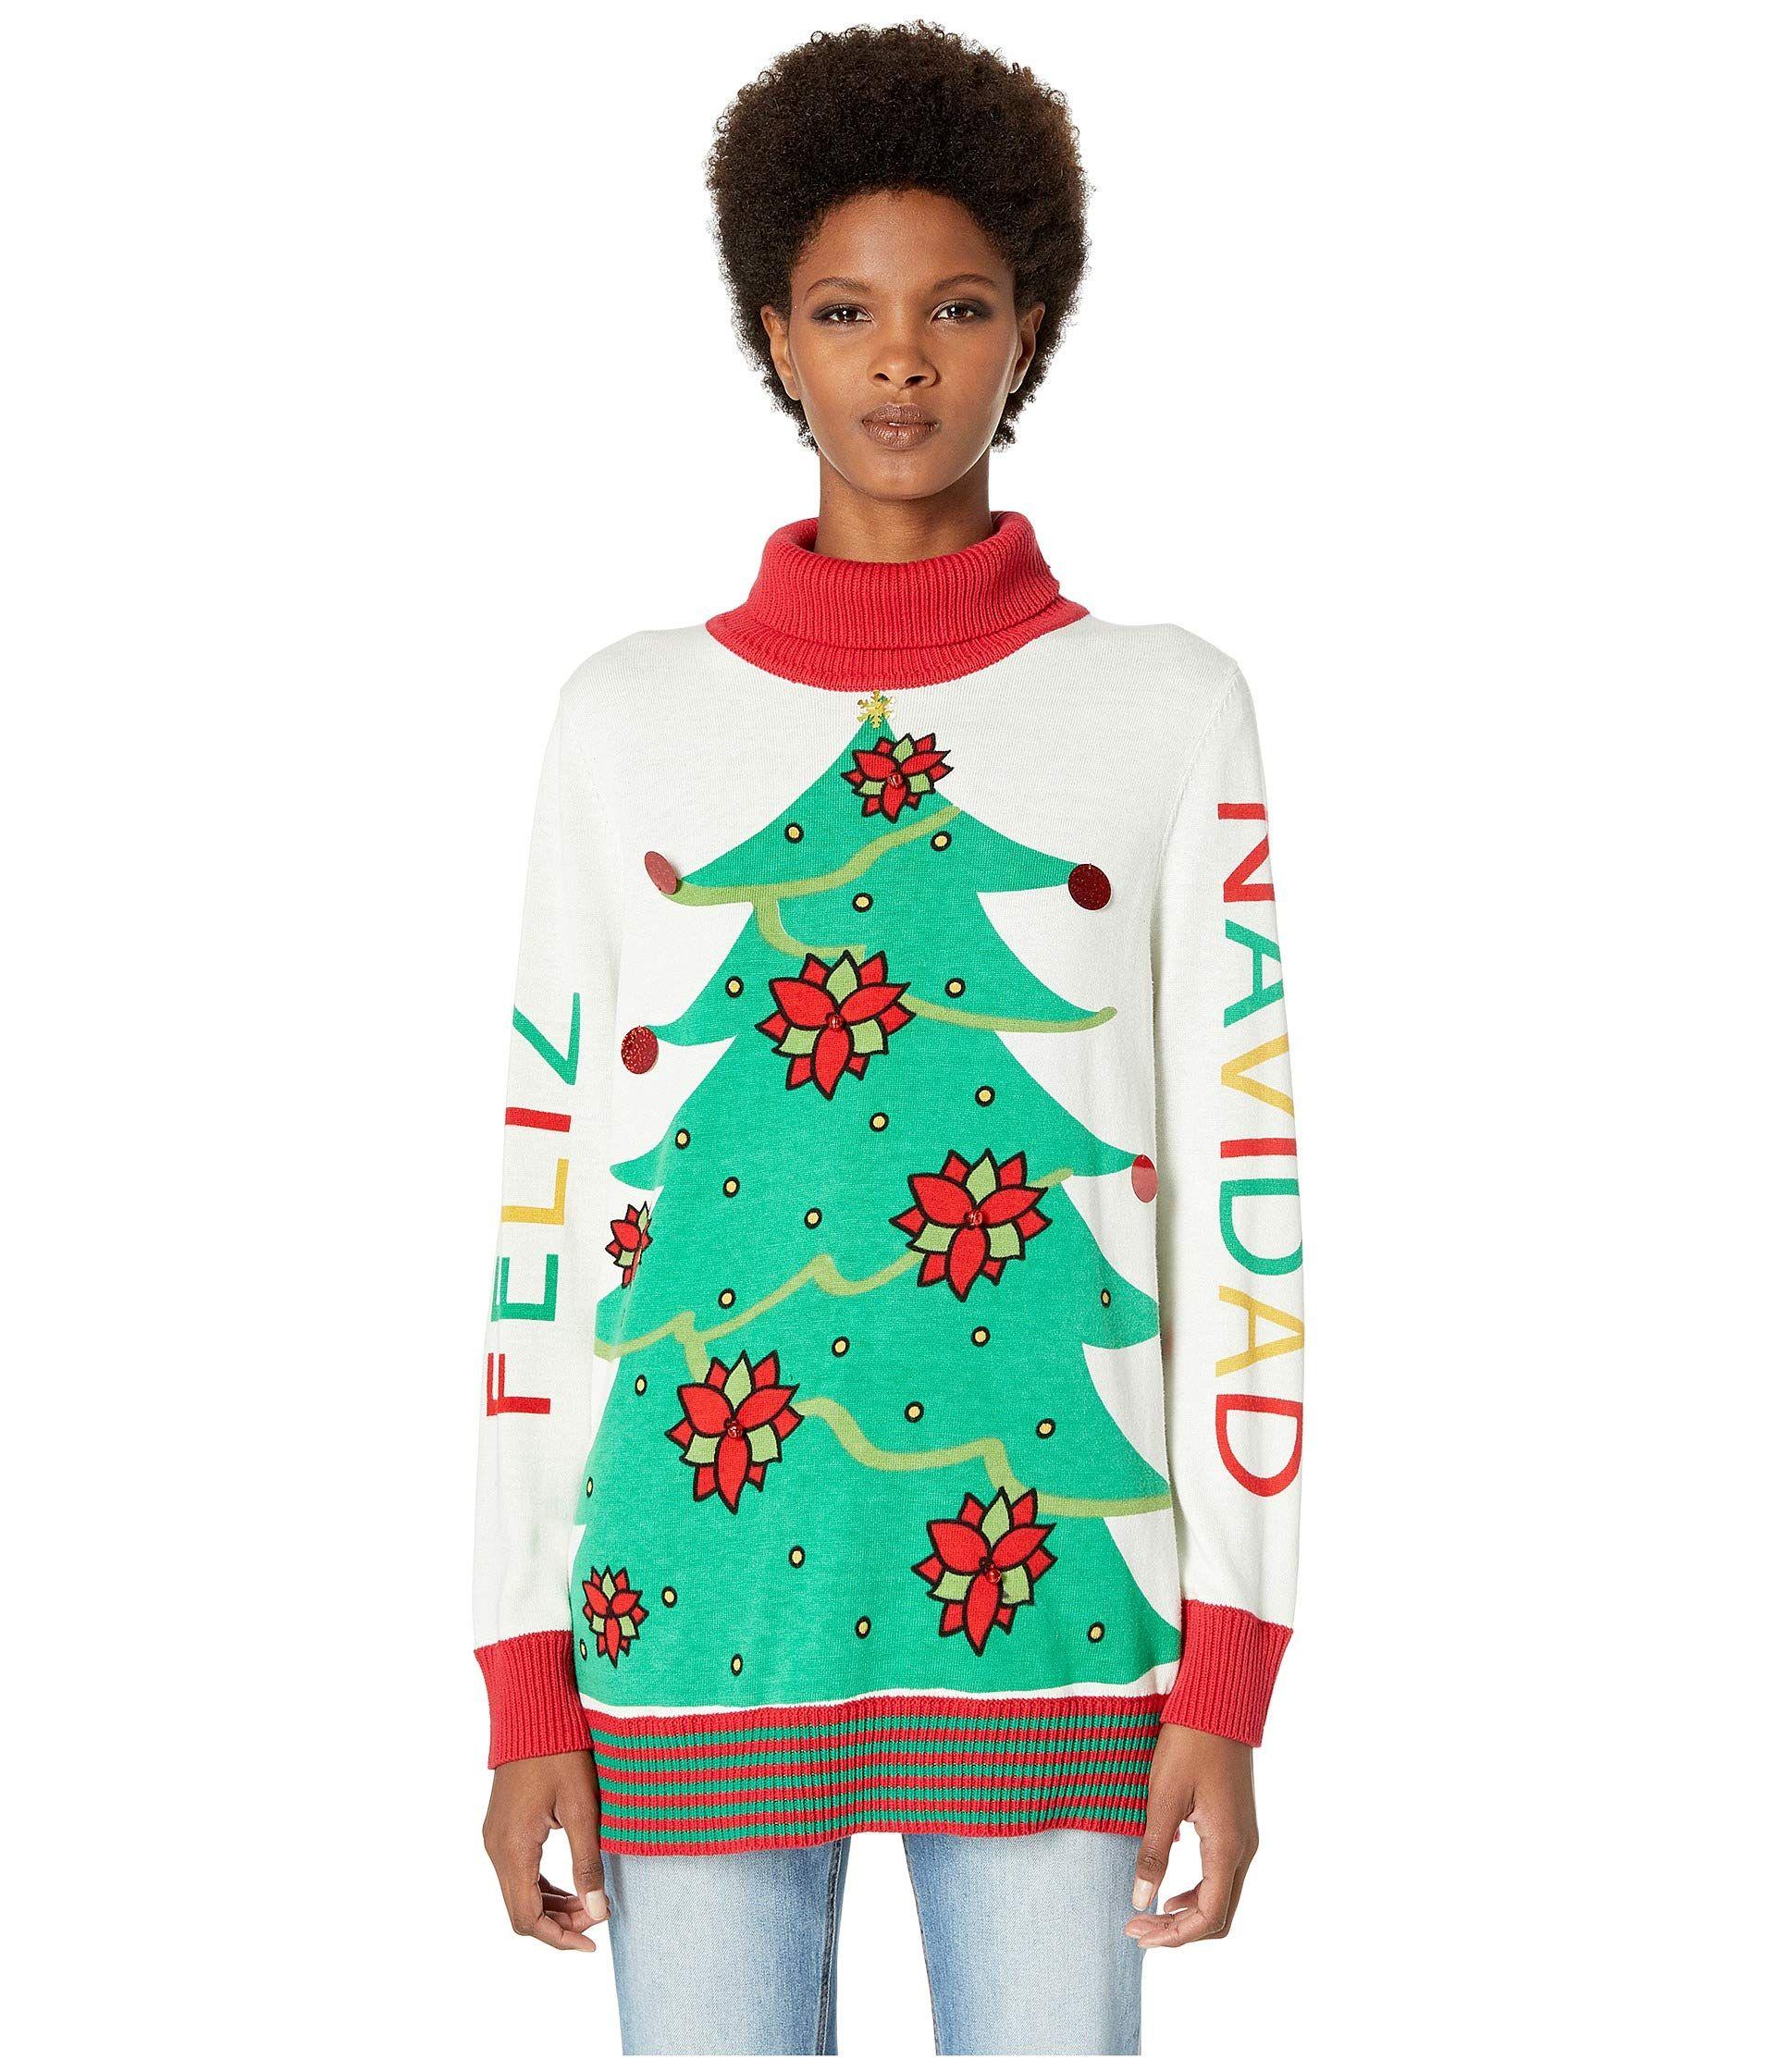 342238e3 Whoopi Goldberg Ugly Christmas Sweater Line at Zappos 2018